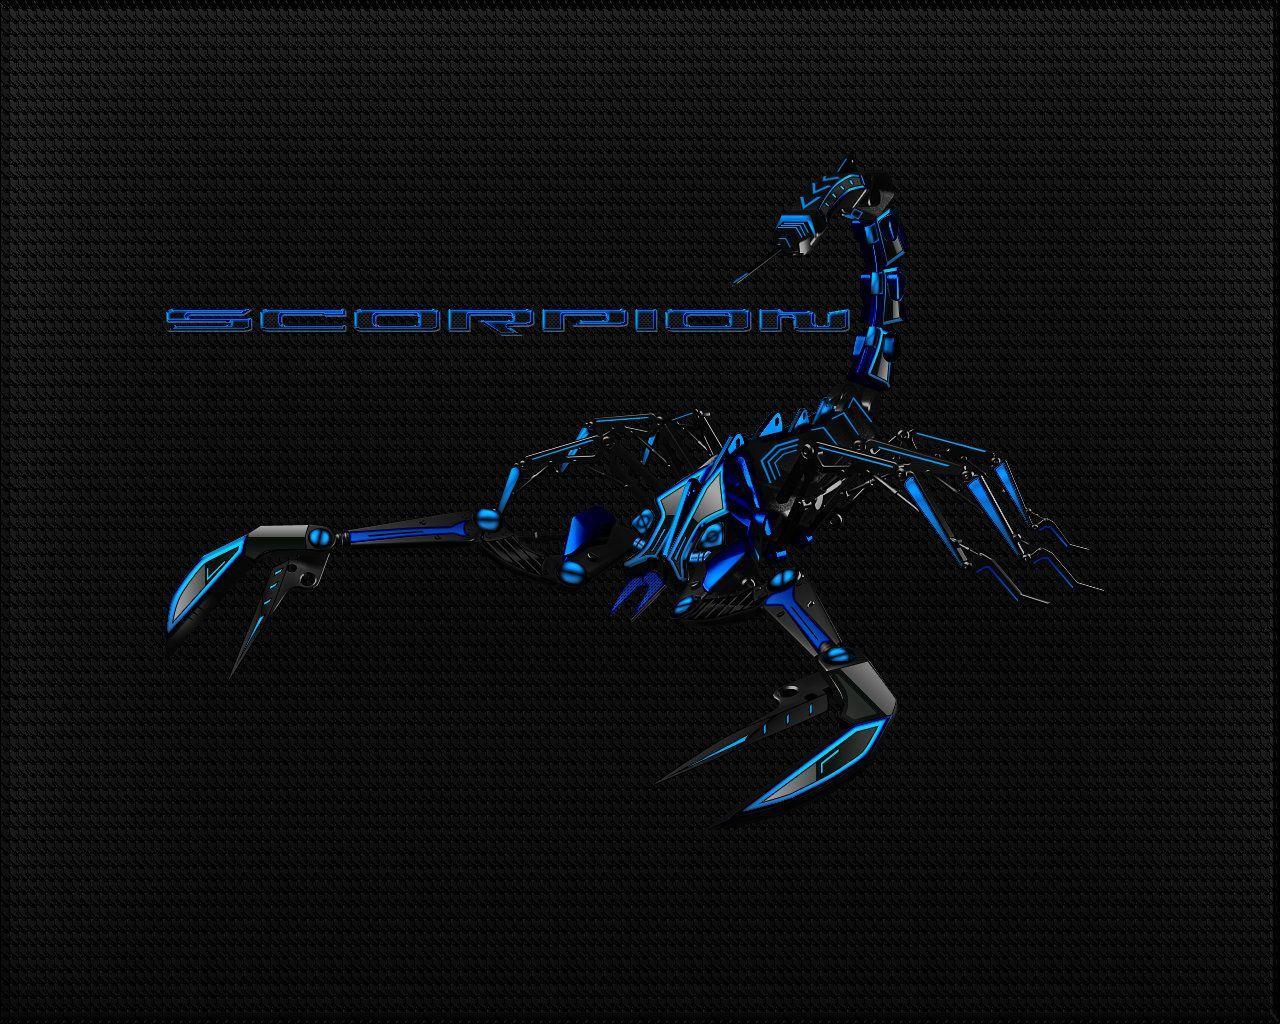 Black Blue Scorpion Wallpaper By Micro31337 On DeviantArt